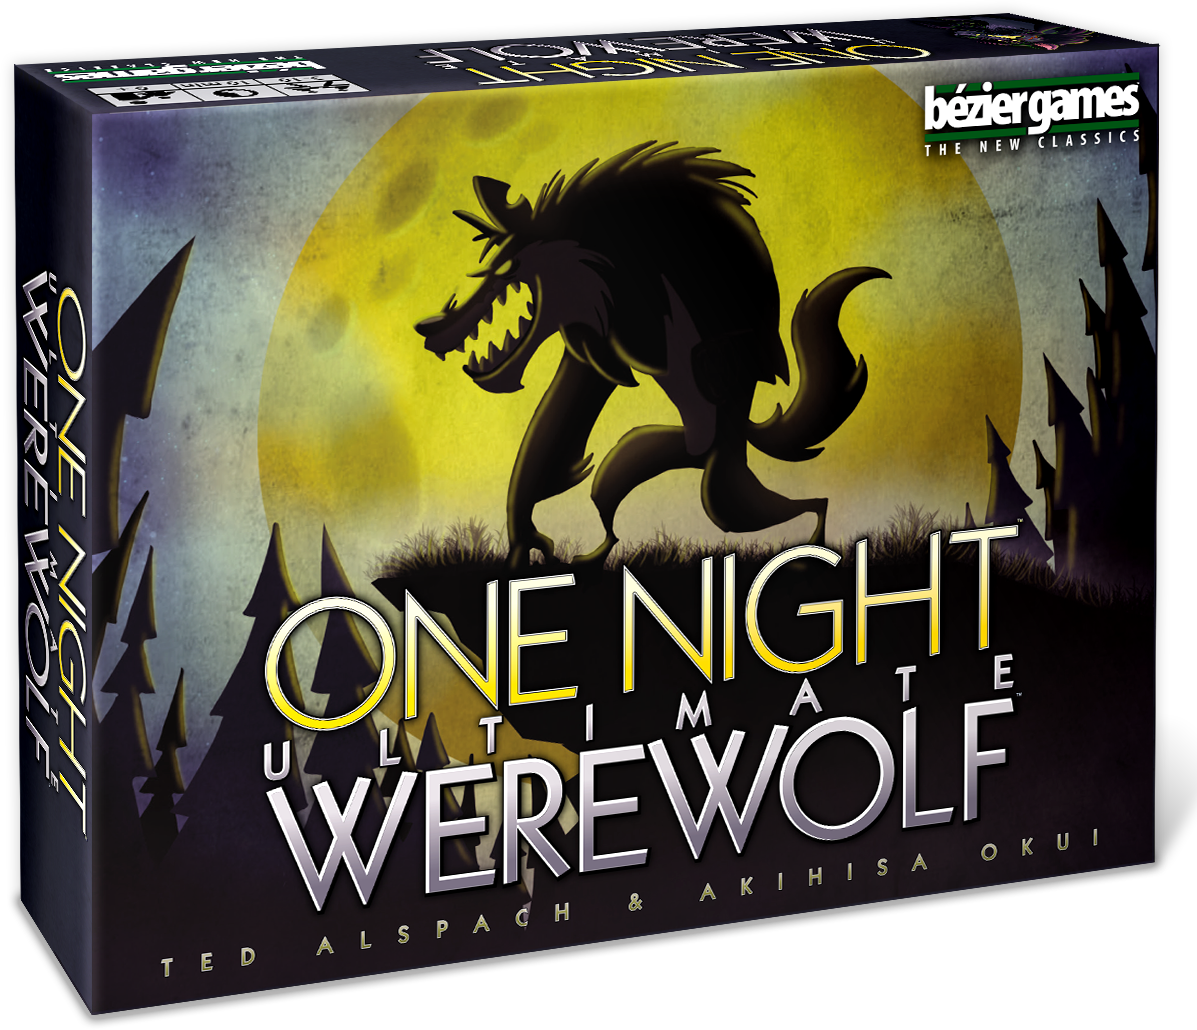 [15 mins] One Night Ultimate Werewolf